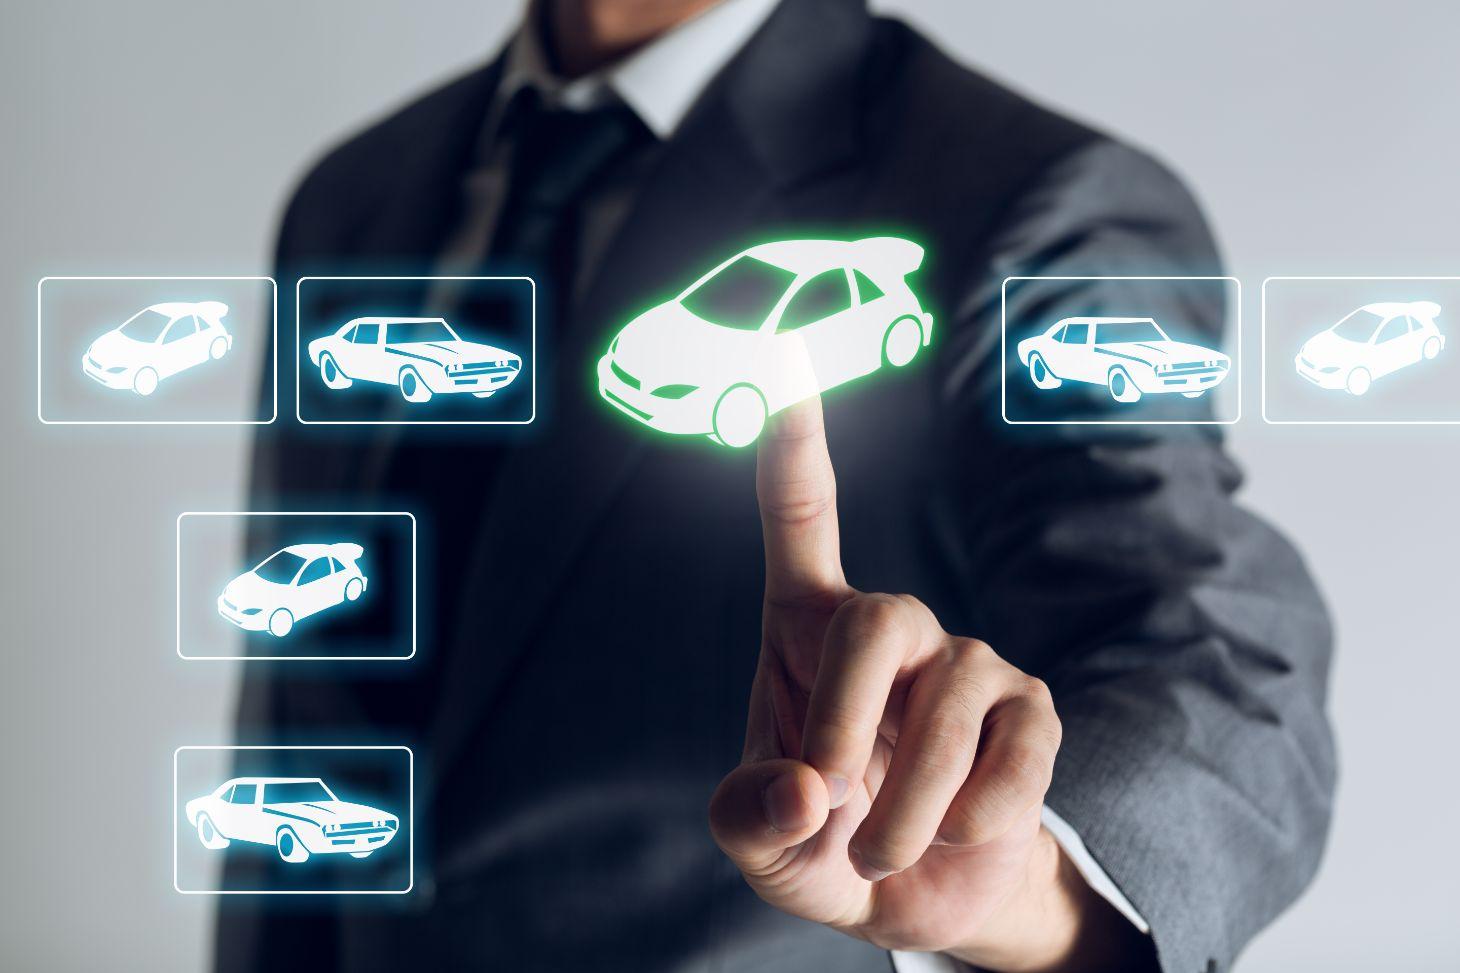 compra de carro online